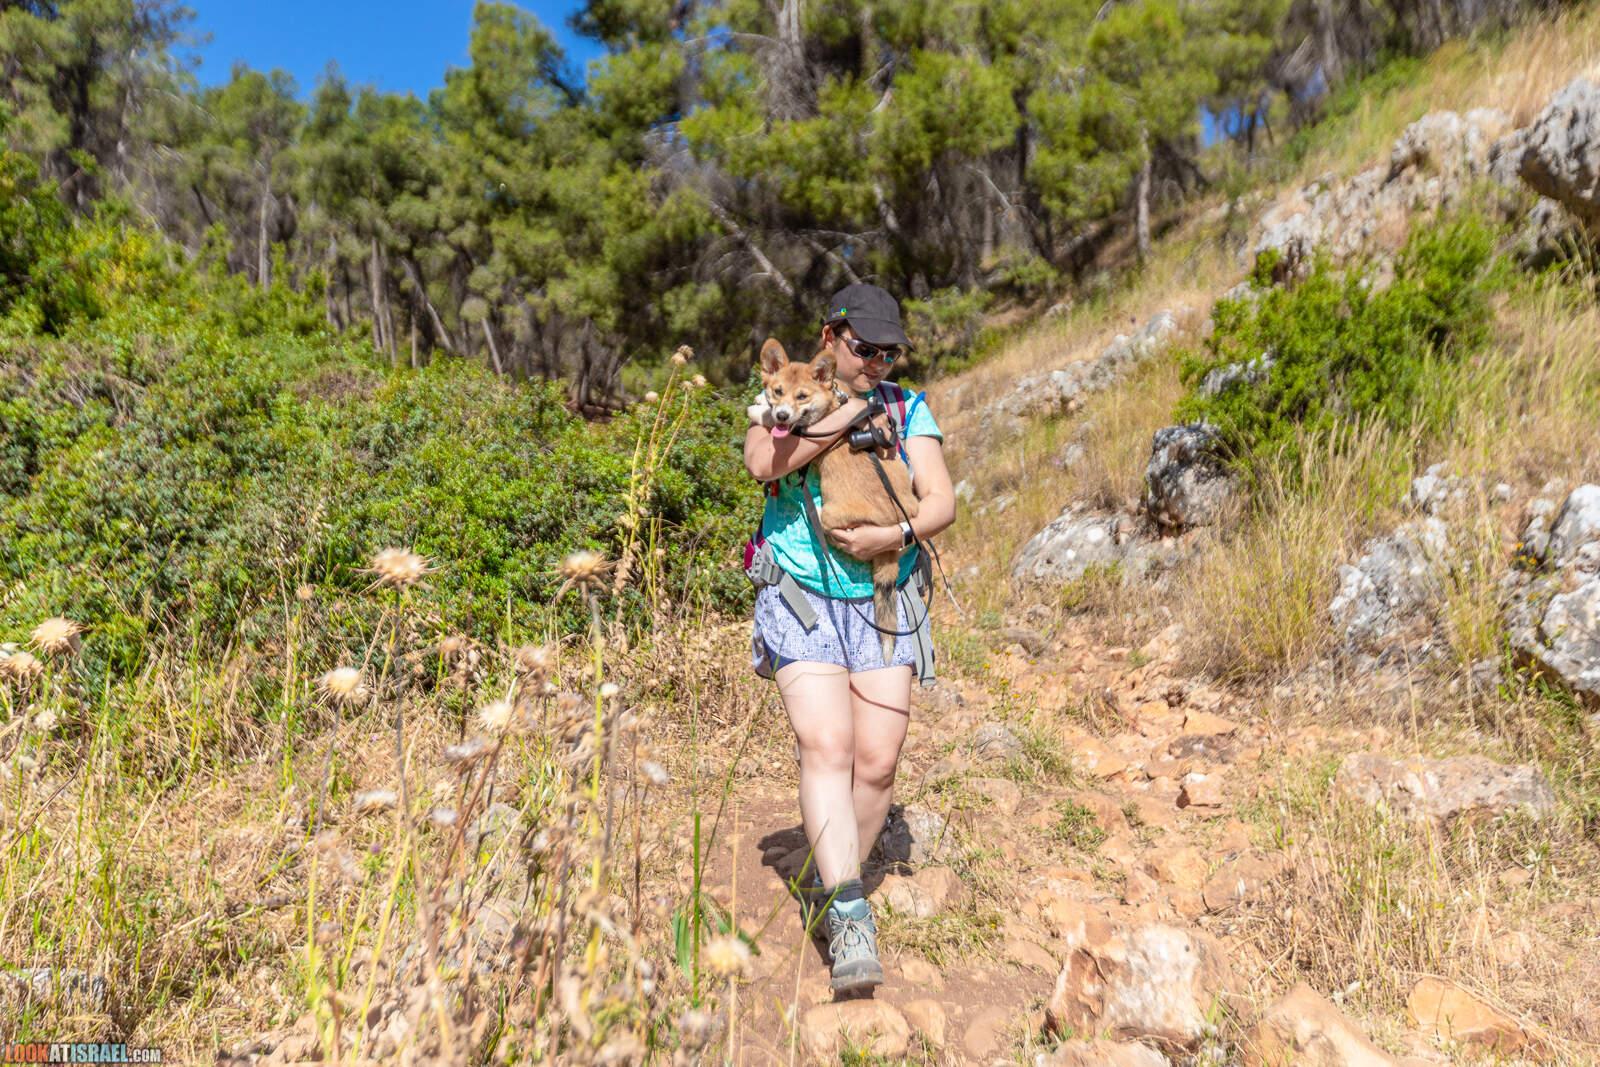 Ущелье Нахаль Ицпор - נחל יצפור - LookAtIsrael.com - Фото путешествия по Израилю